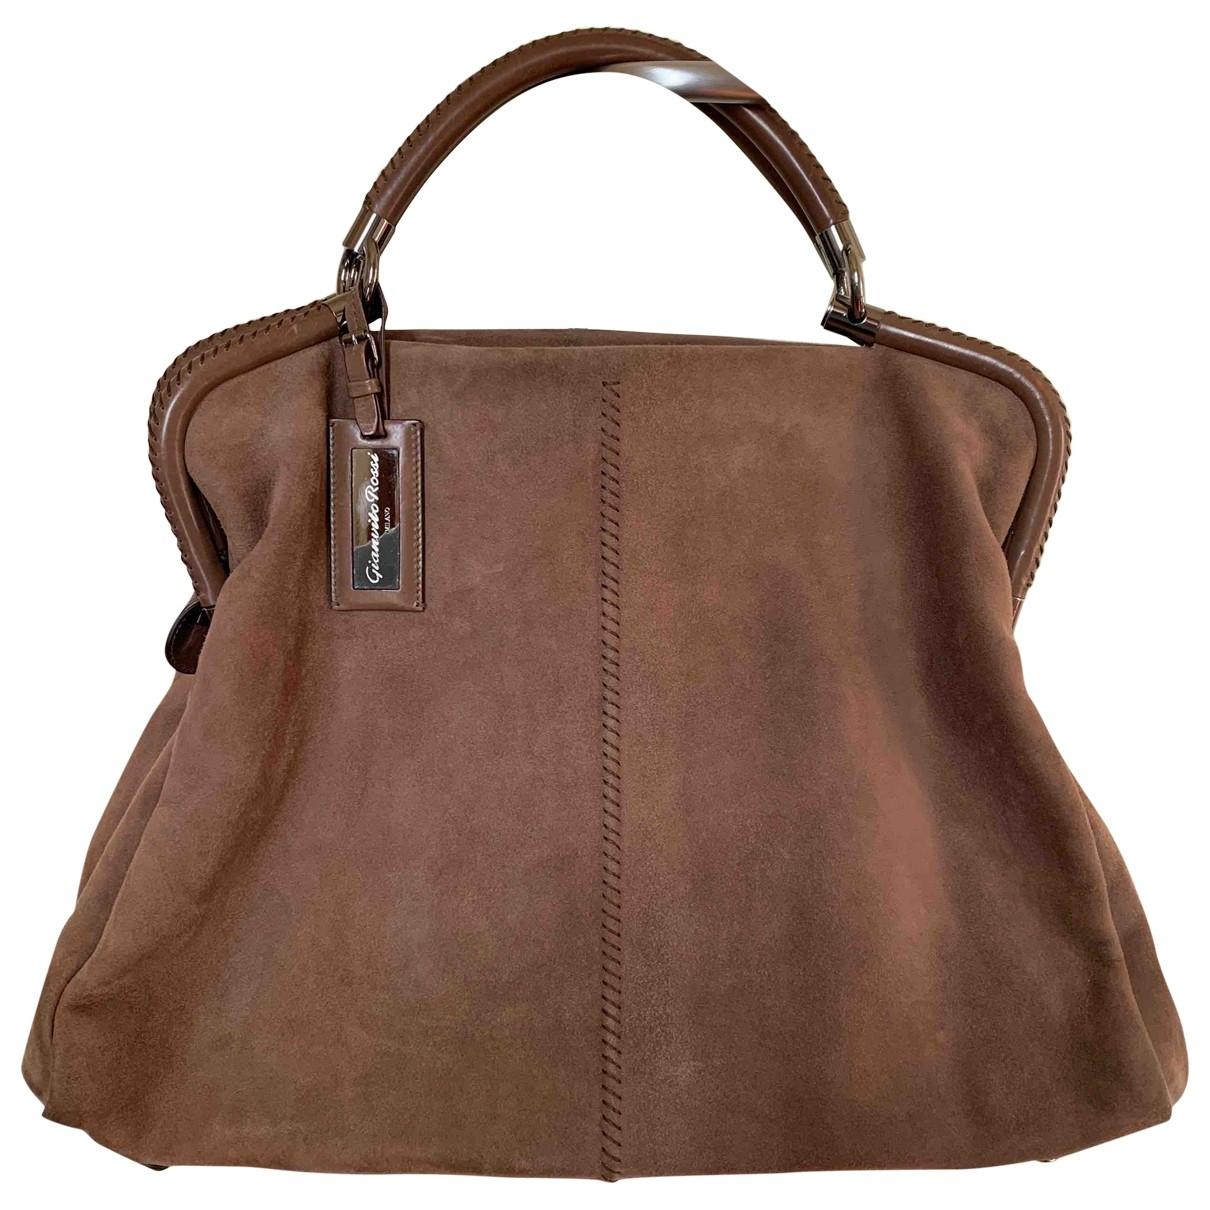 Gianvito Rossi \N Beige Suede handbag for Women \N